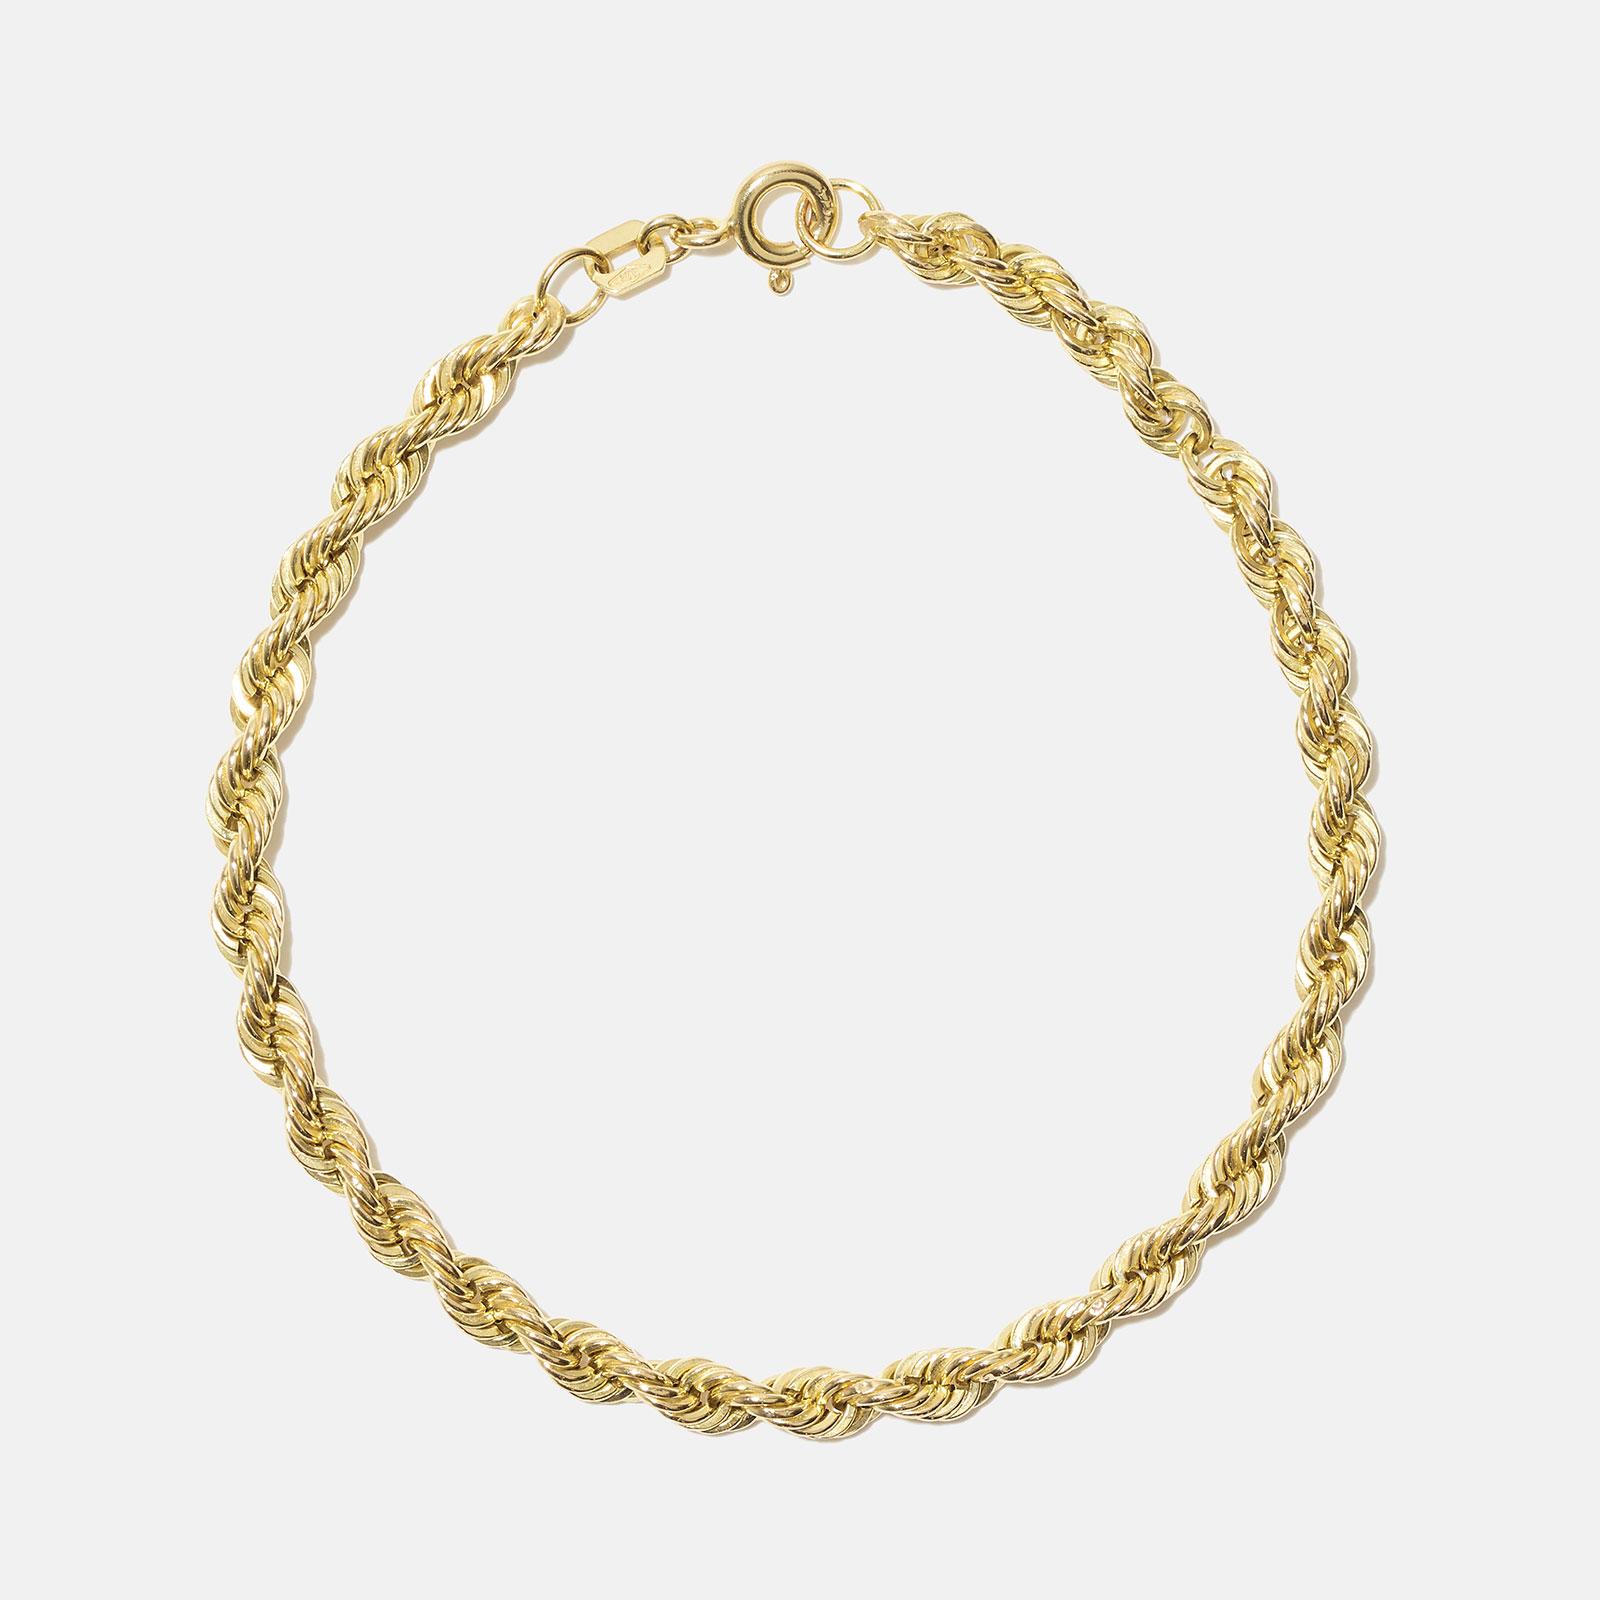 Armband 9K Guld - replänk